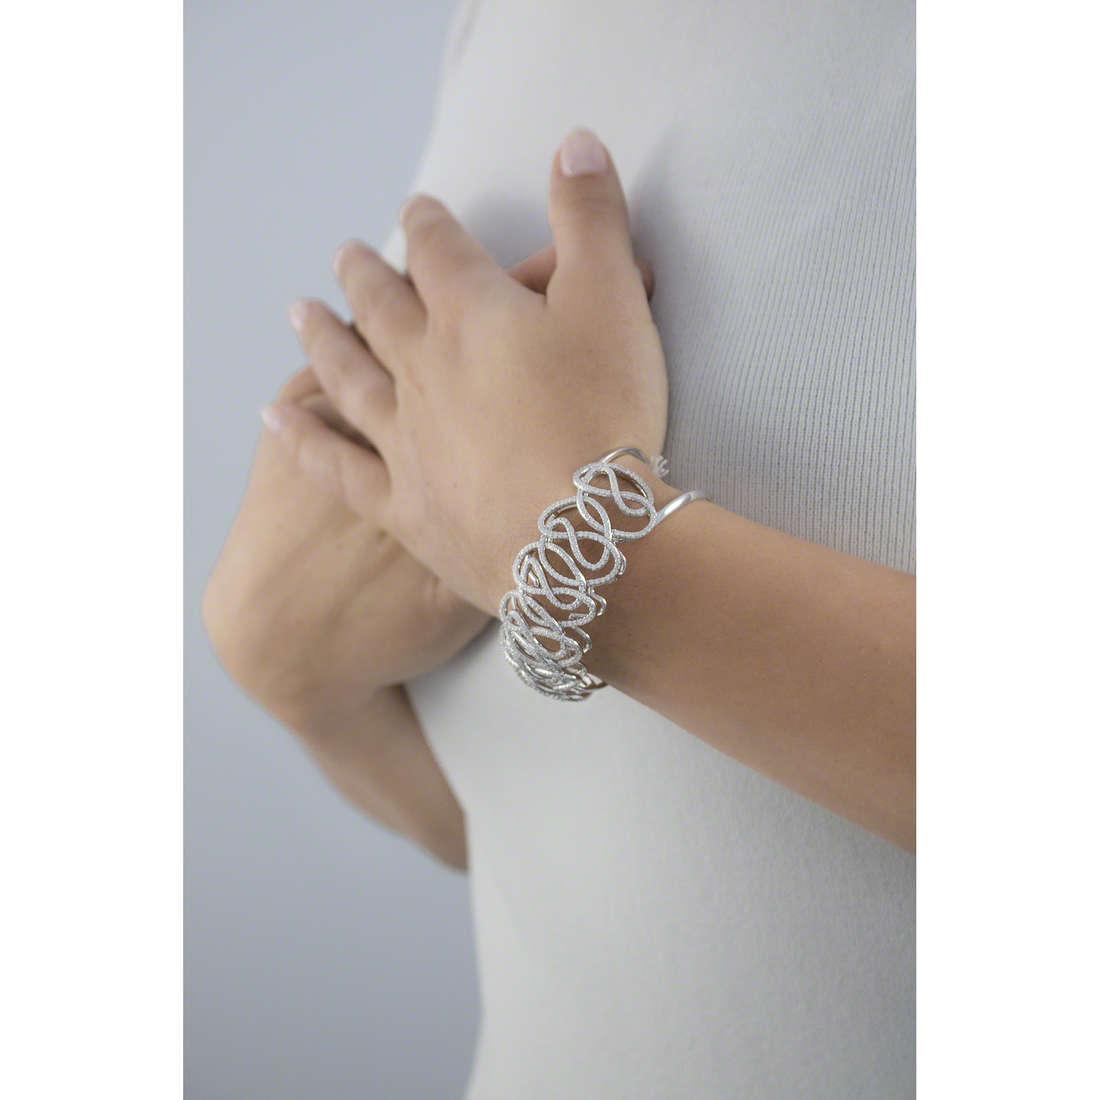 Morellato bracelets 1930 Michelle Hunziker woman SAHA05 indosso